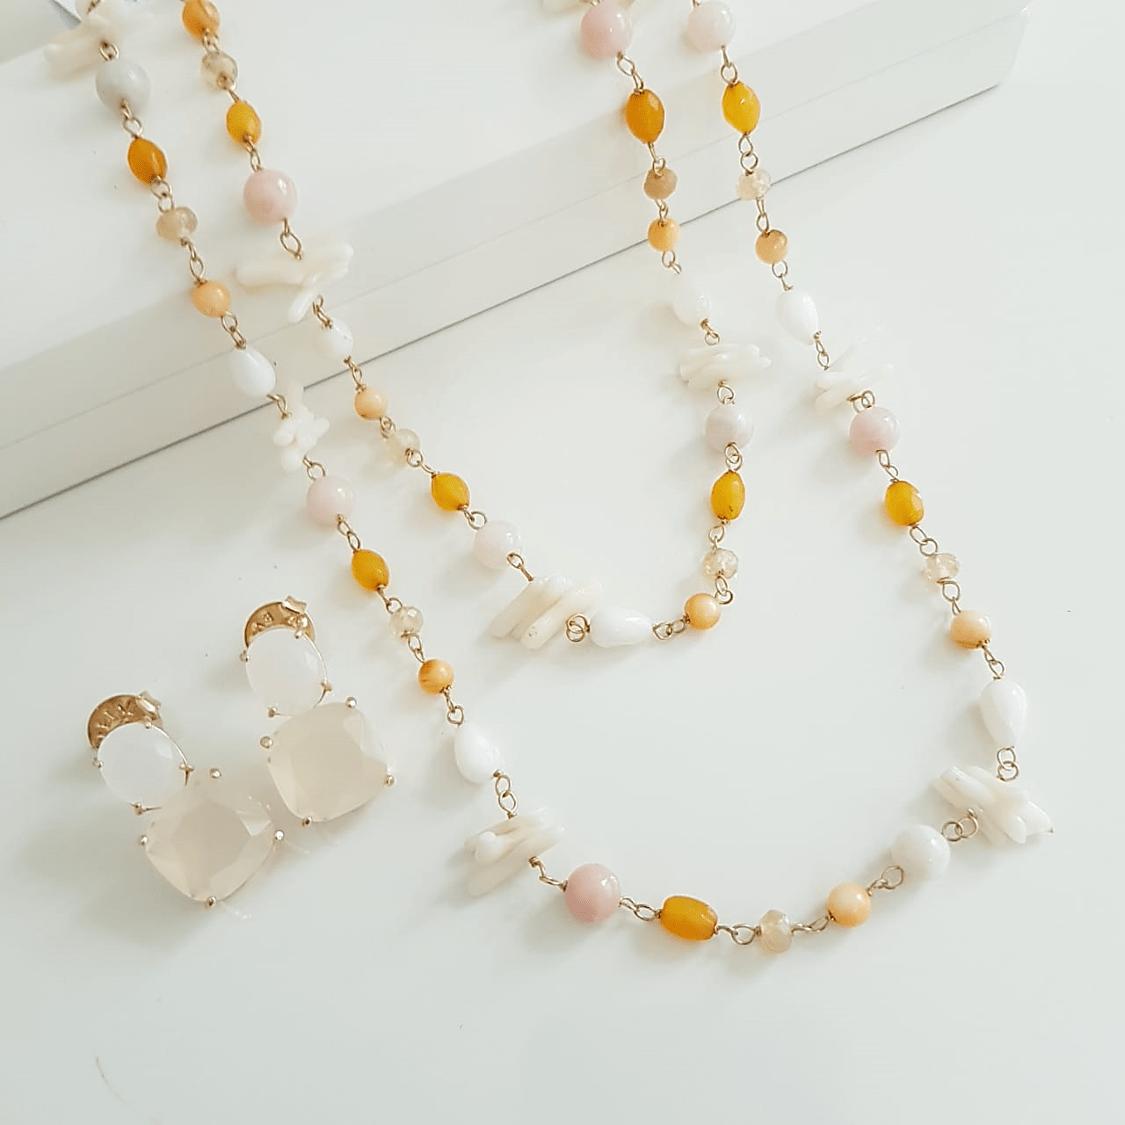 Conjunto Bella - colar longo tom amarelo e par de brincos cristal leitoso